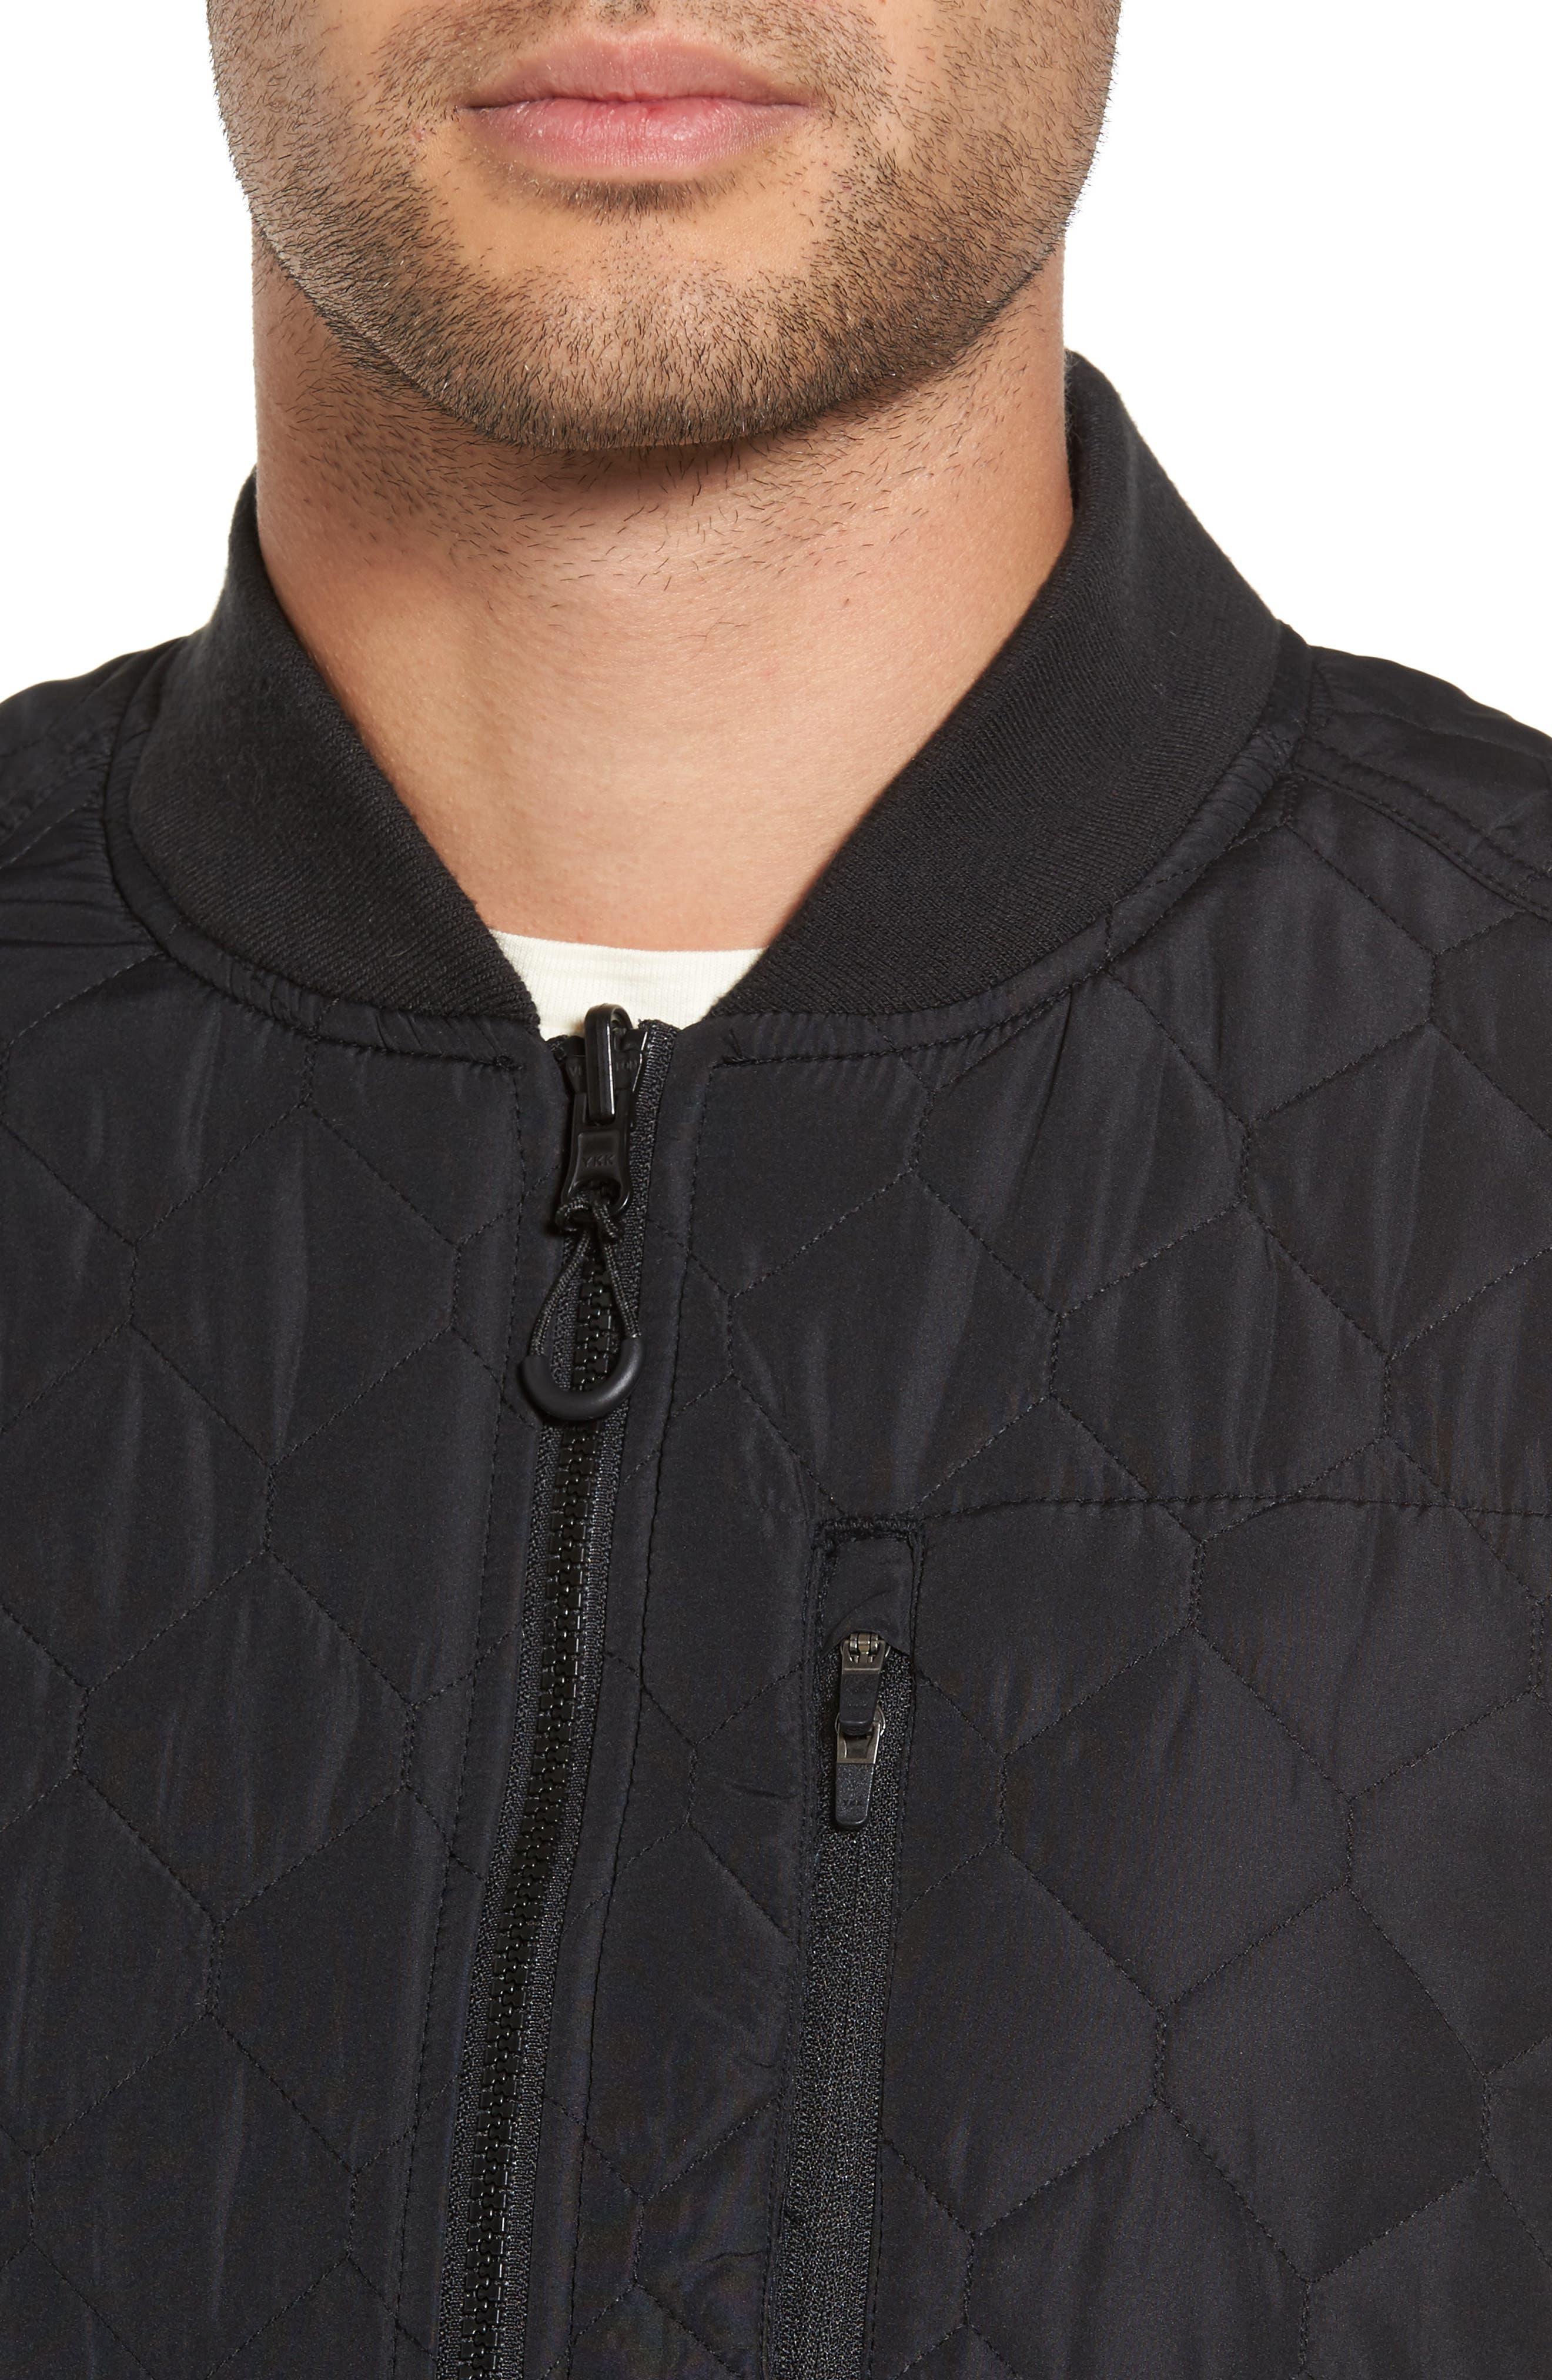 Replicant Quilted Vest,                             Alternate thumbnail 4, color,                             Black